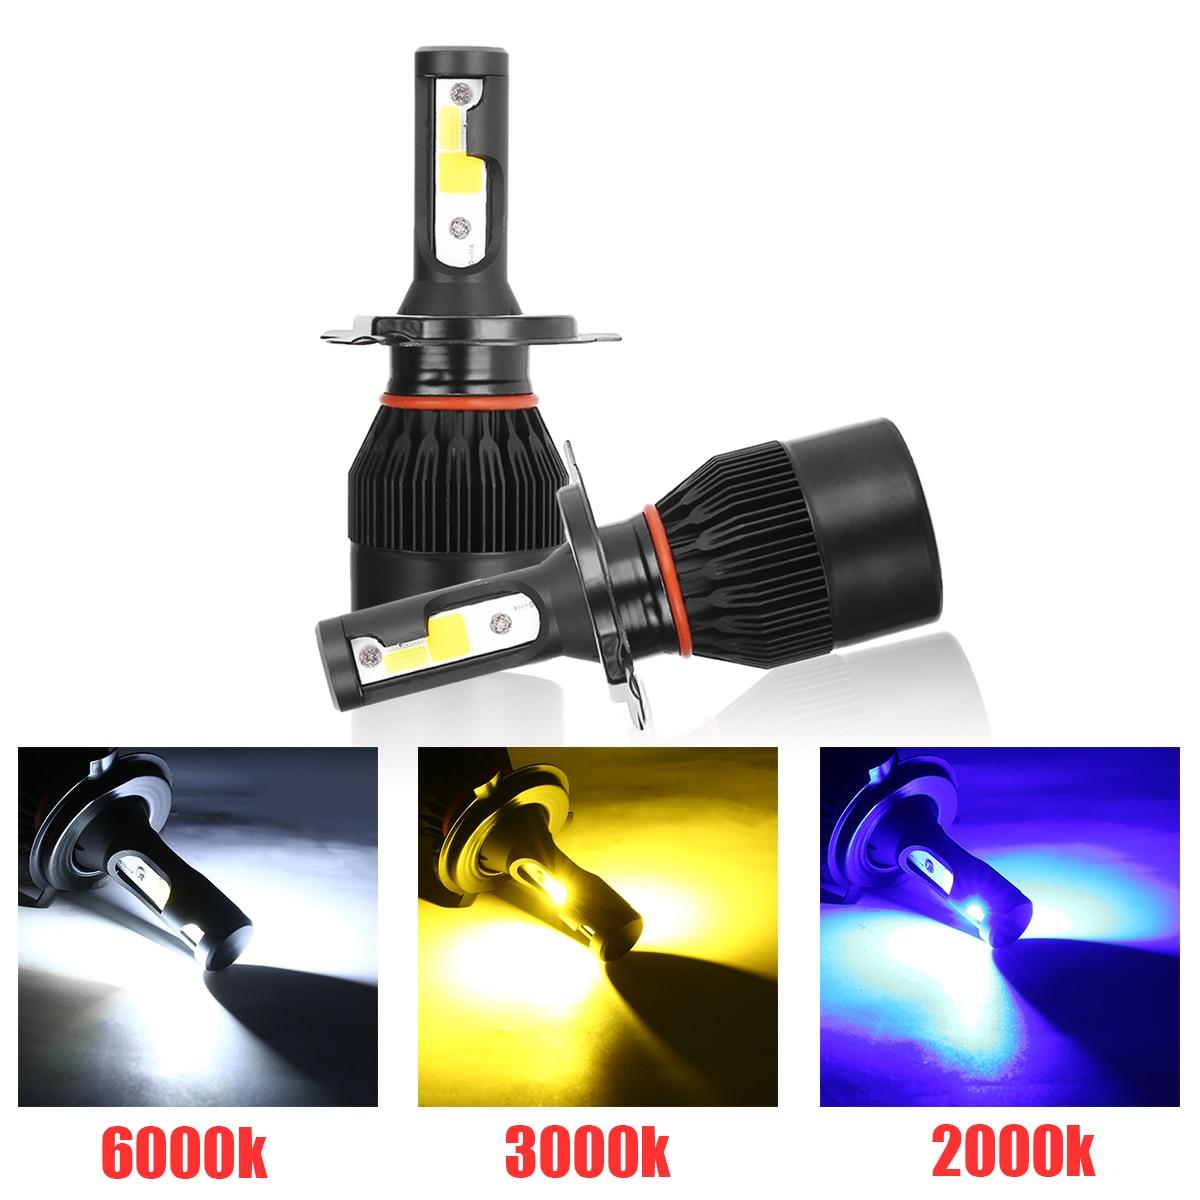 1 Pair LED H4 COB LED Headlight Bulbs 250W 25000LM Car LED Lamp 2000K Blue 3000K Yellow 6000K White Fog Lamp